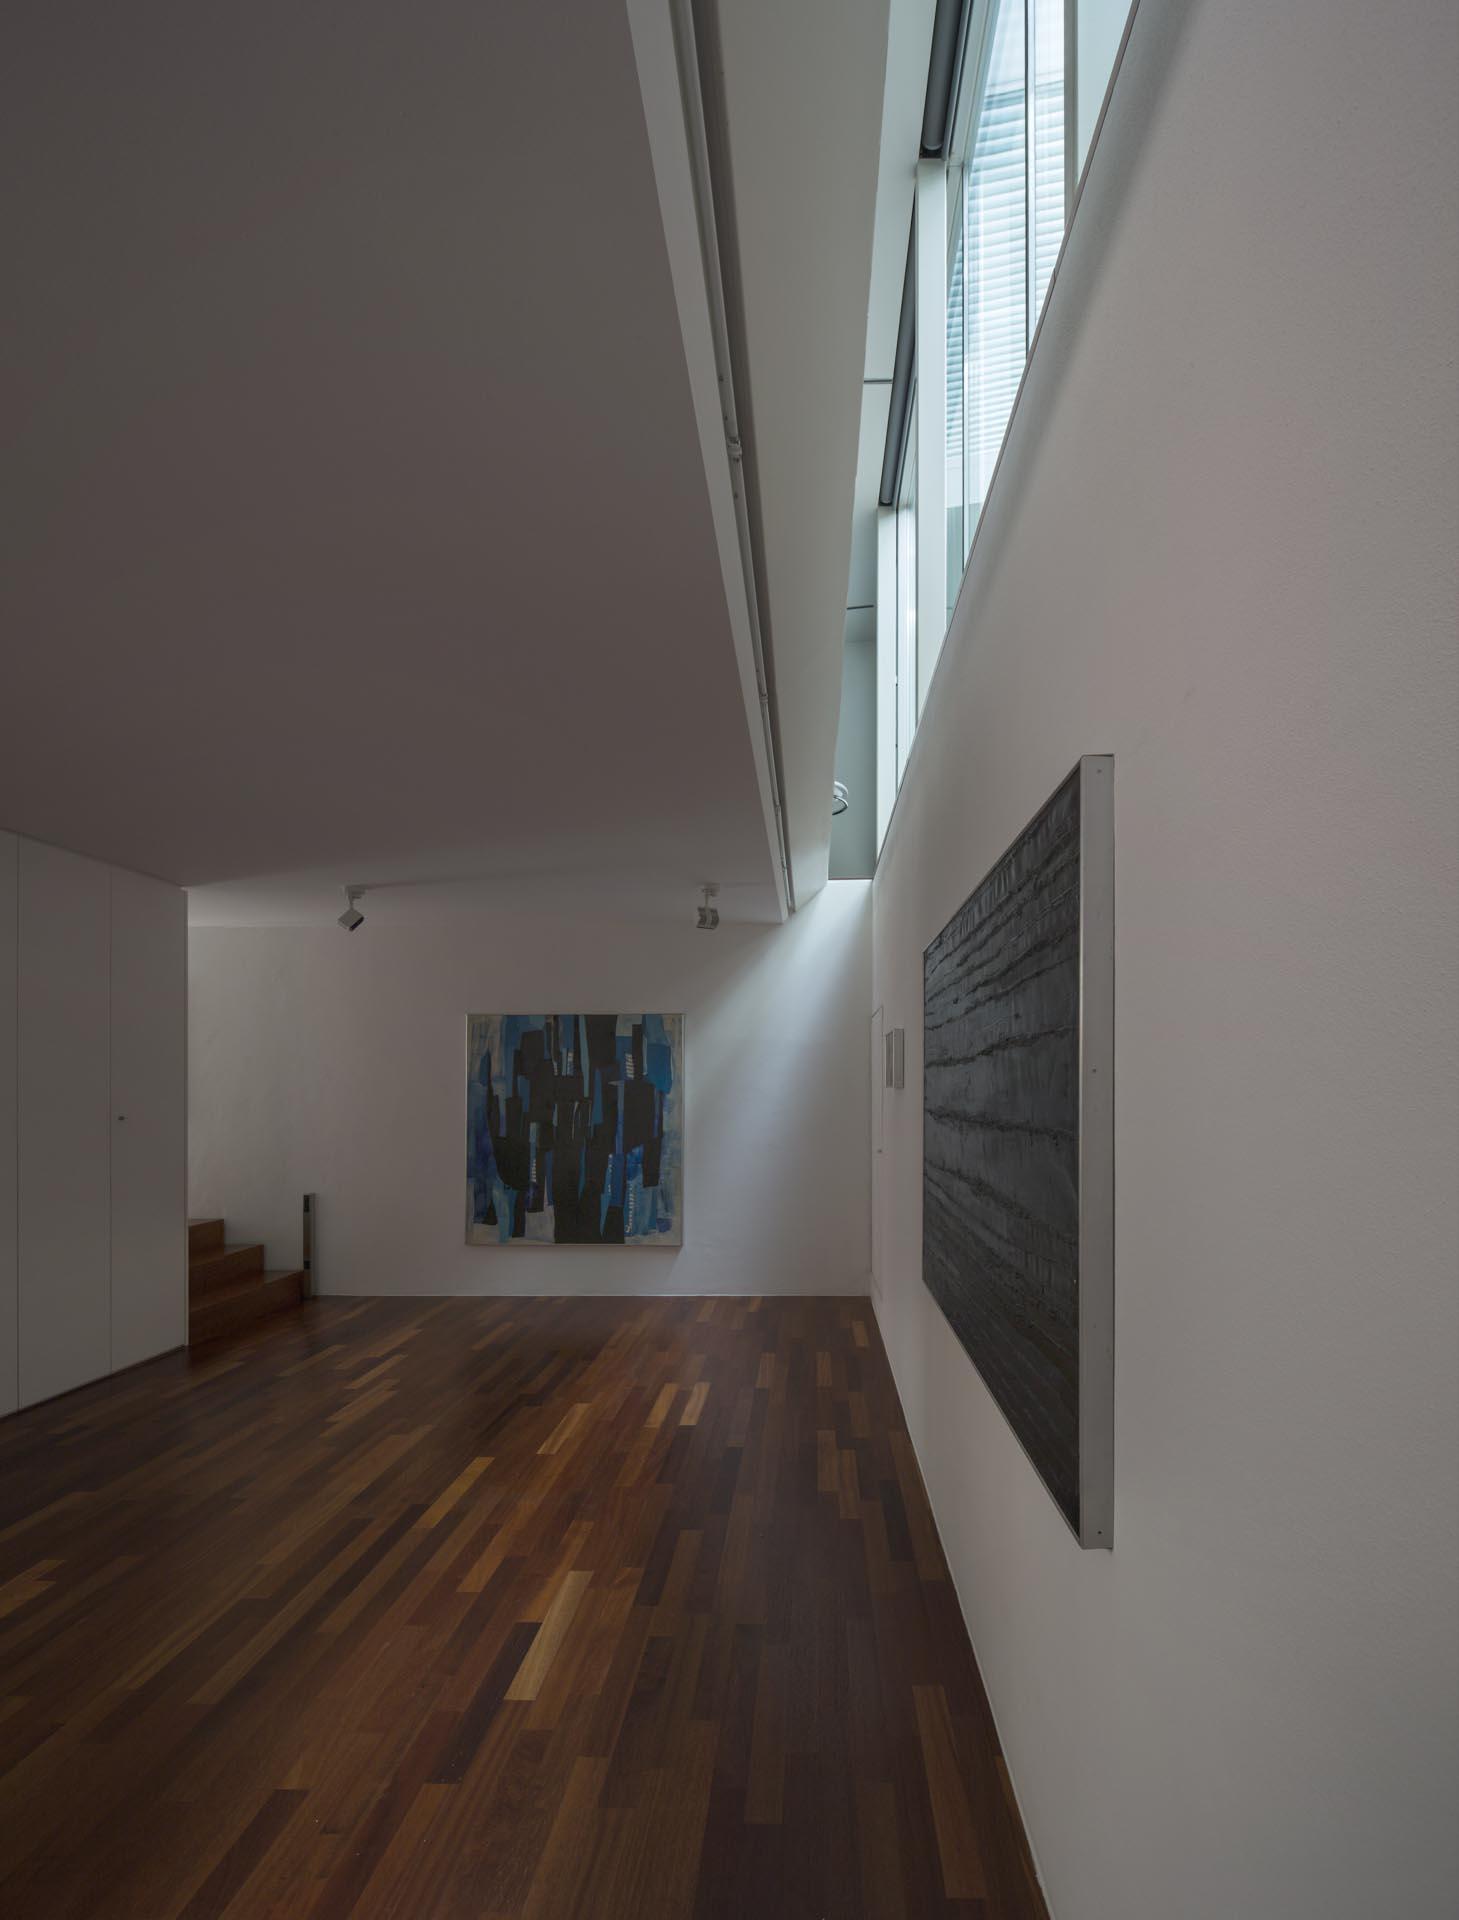 sala esposizione quadri